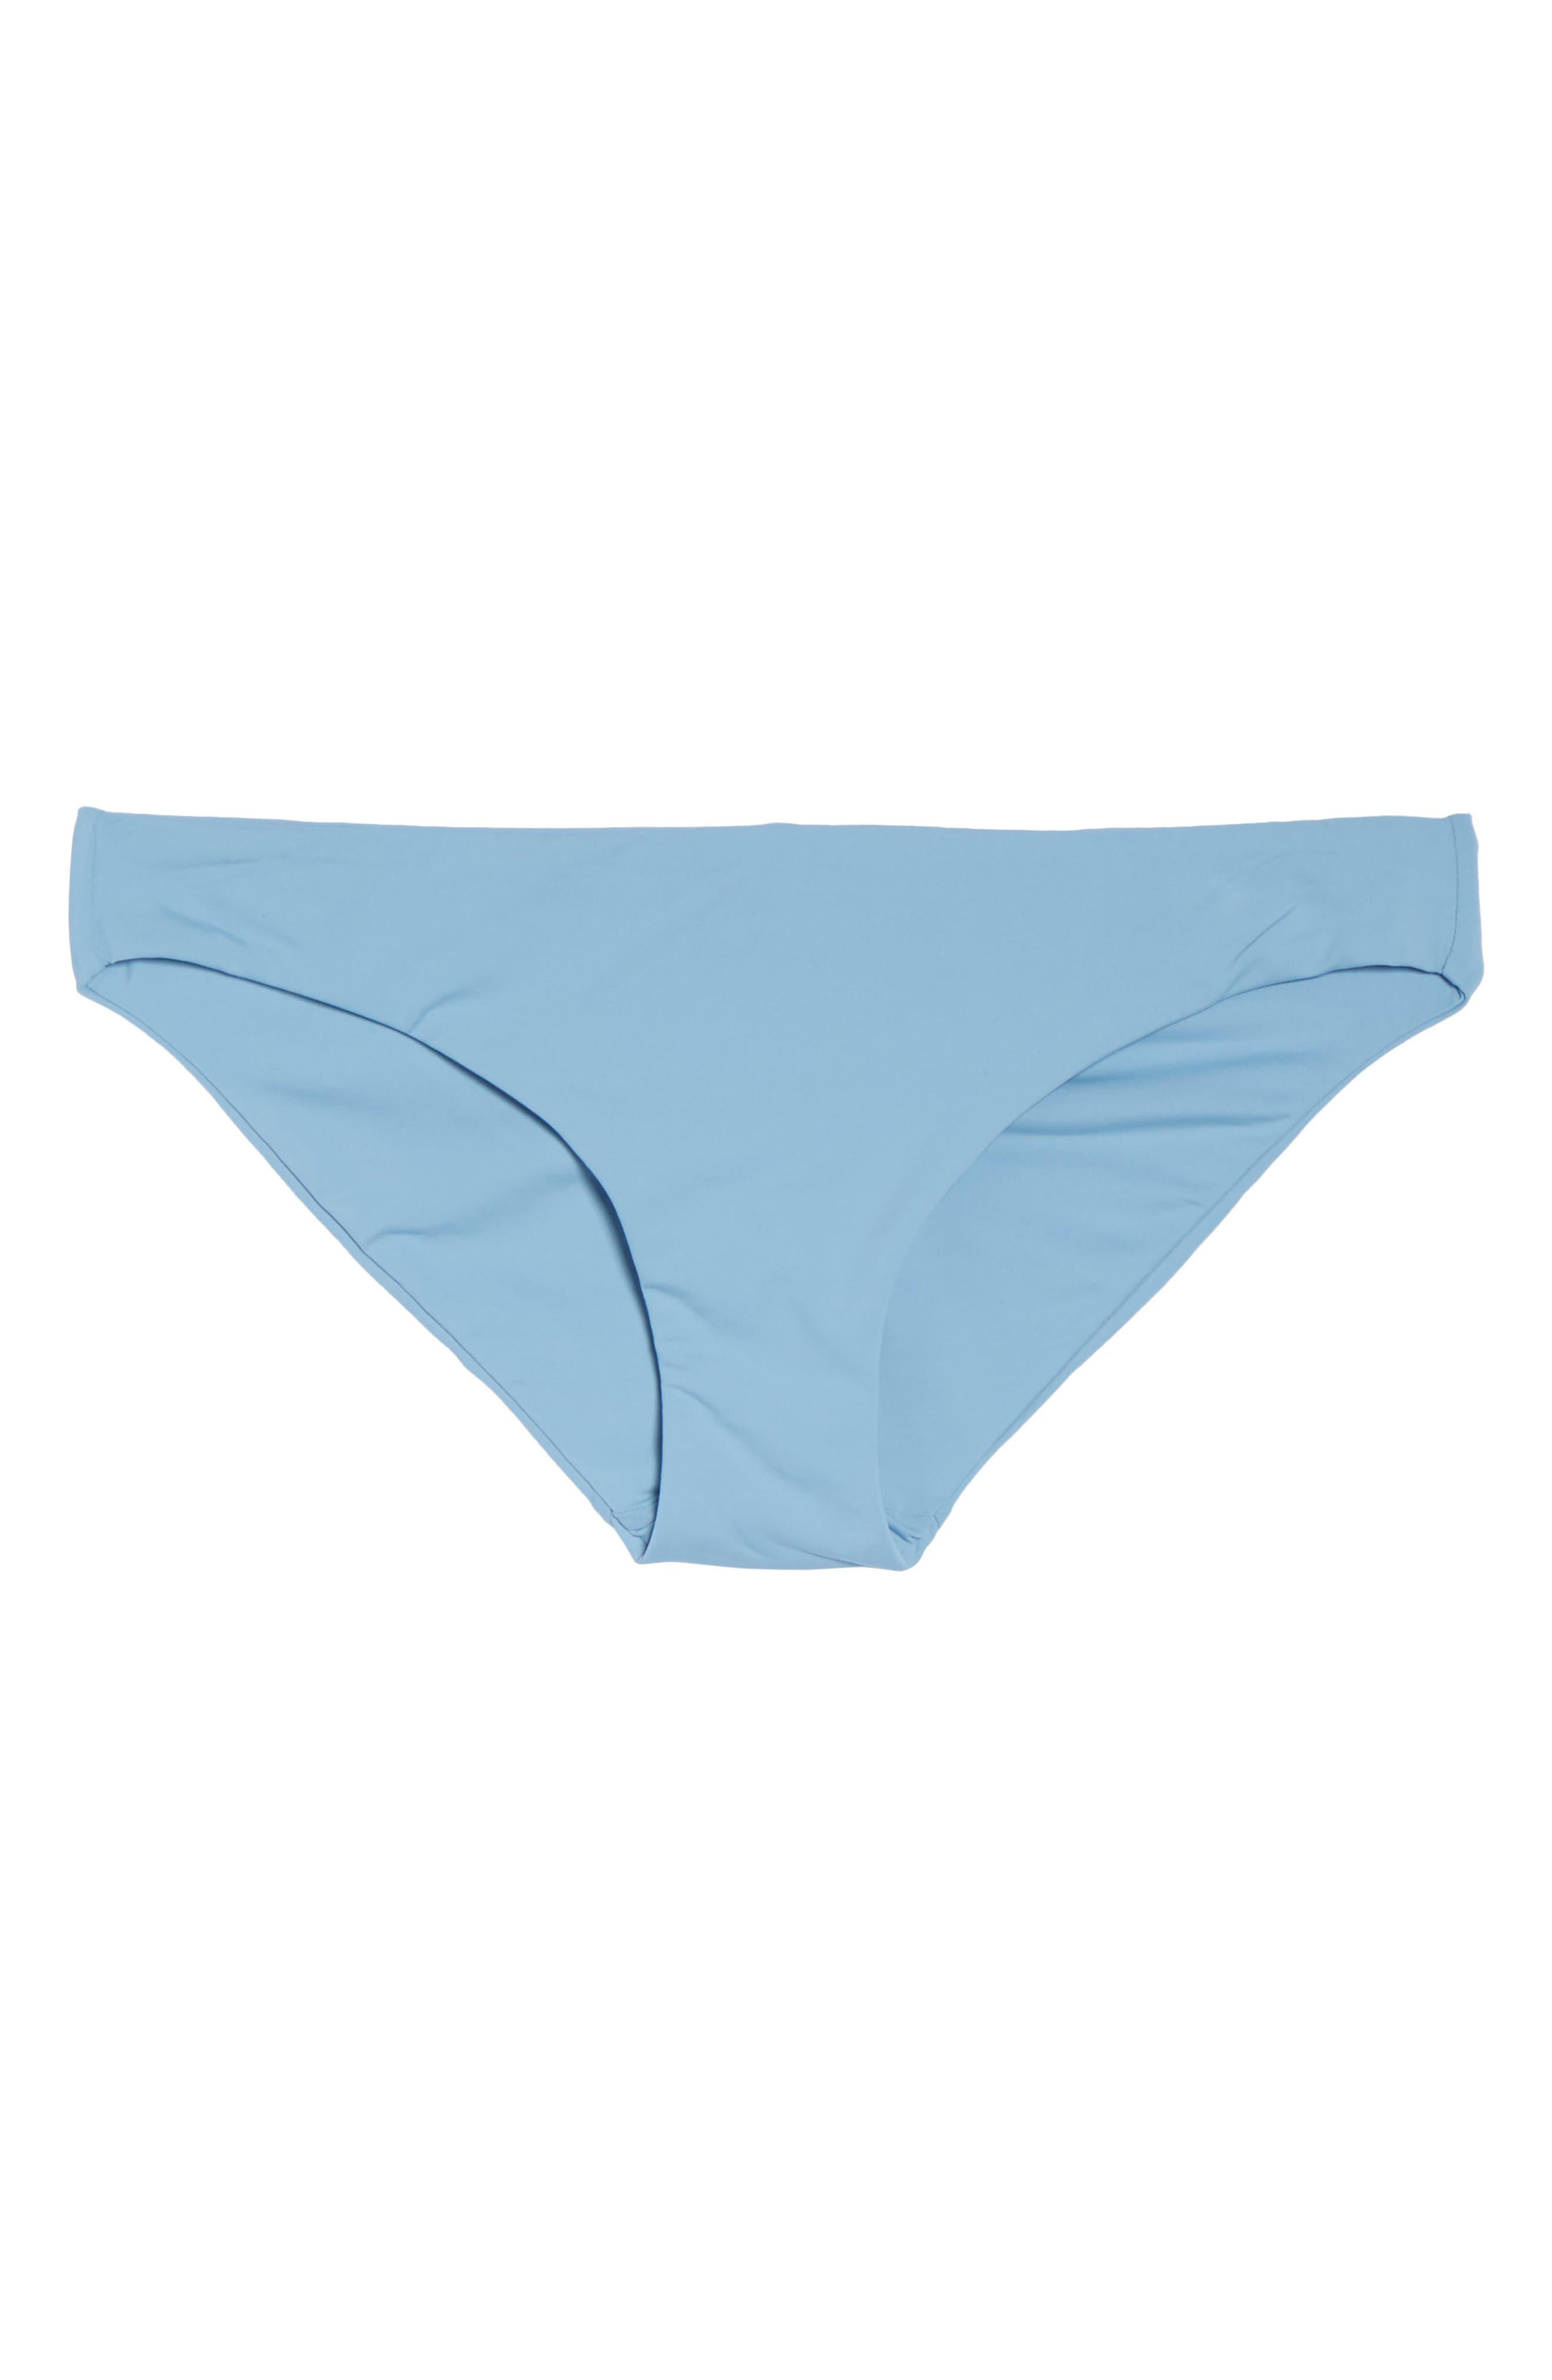 Active Bikini Bottoms,                             Alternate thumbnail 6, color,                             Blue Mist